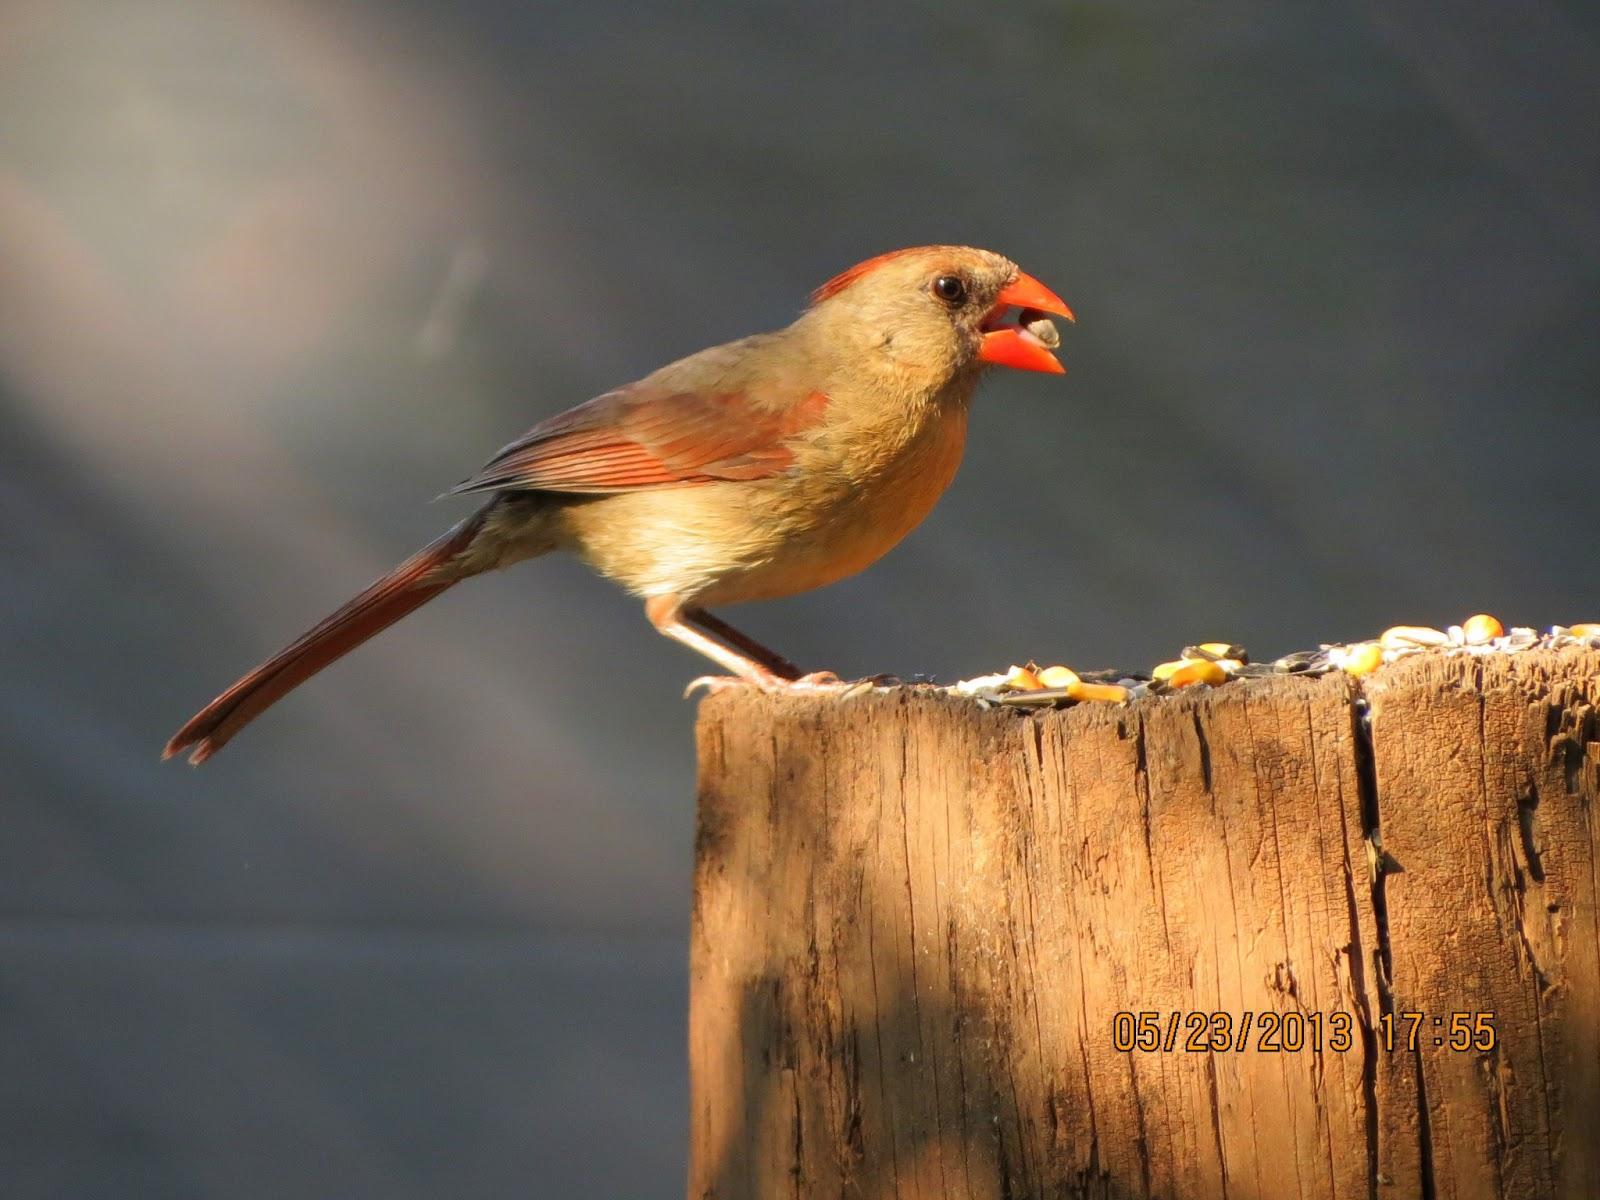 Where Do Birds Get Their Songs? | Mental Floss